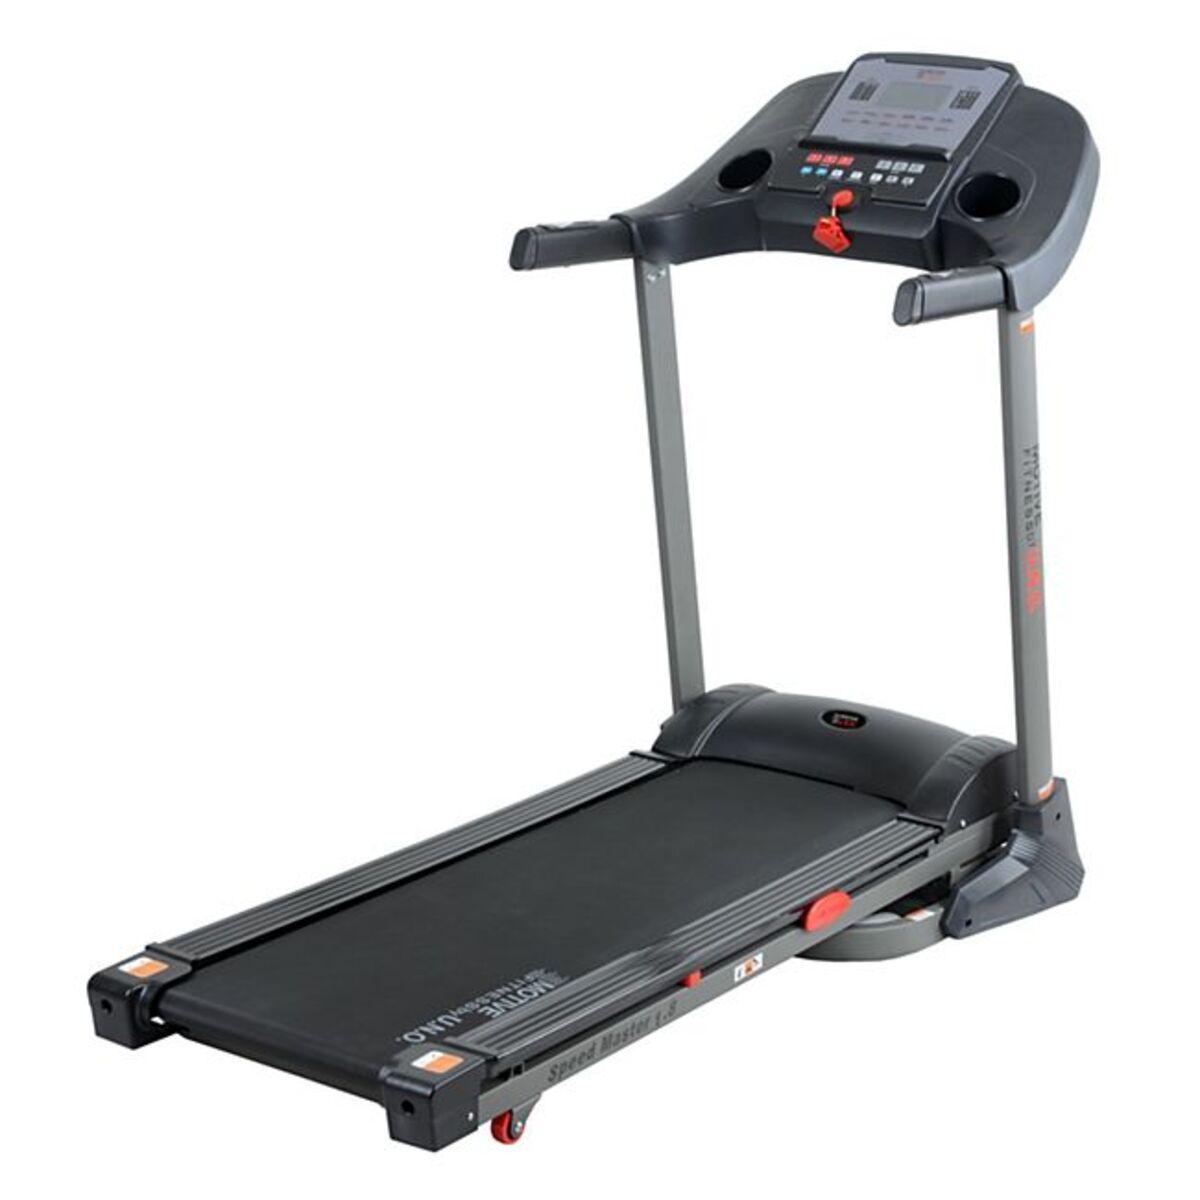 Bild 1 von Motive Fitness by U.N.O. Laufband Speed Master 1.8 grau-schwarz